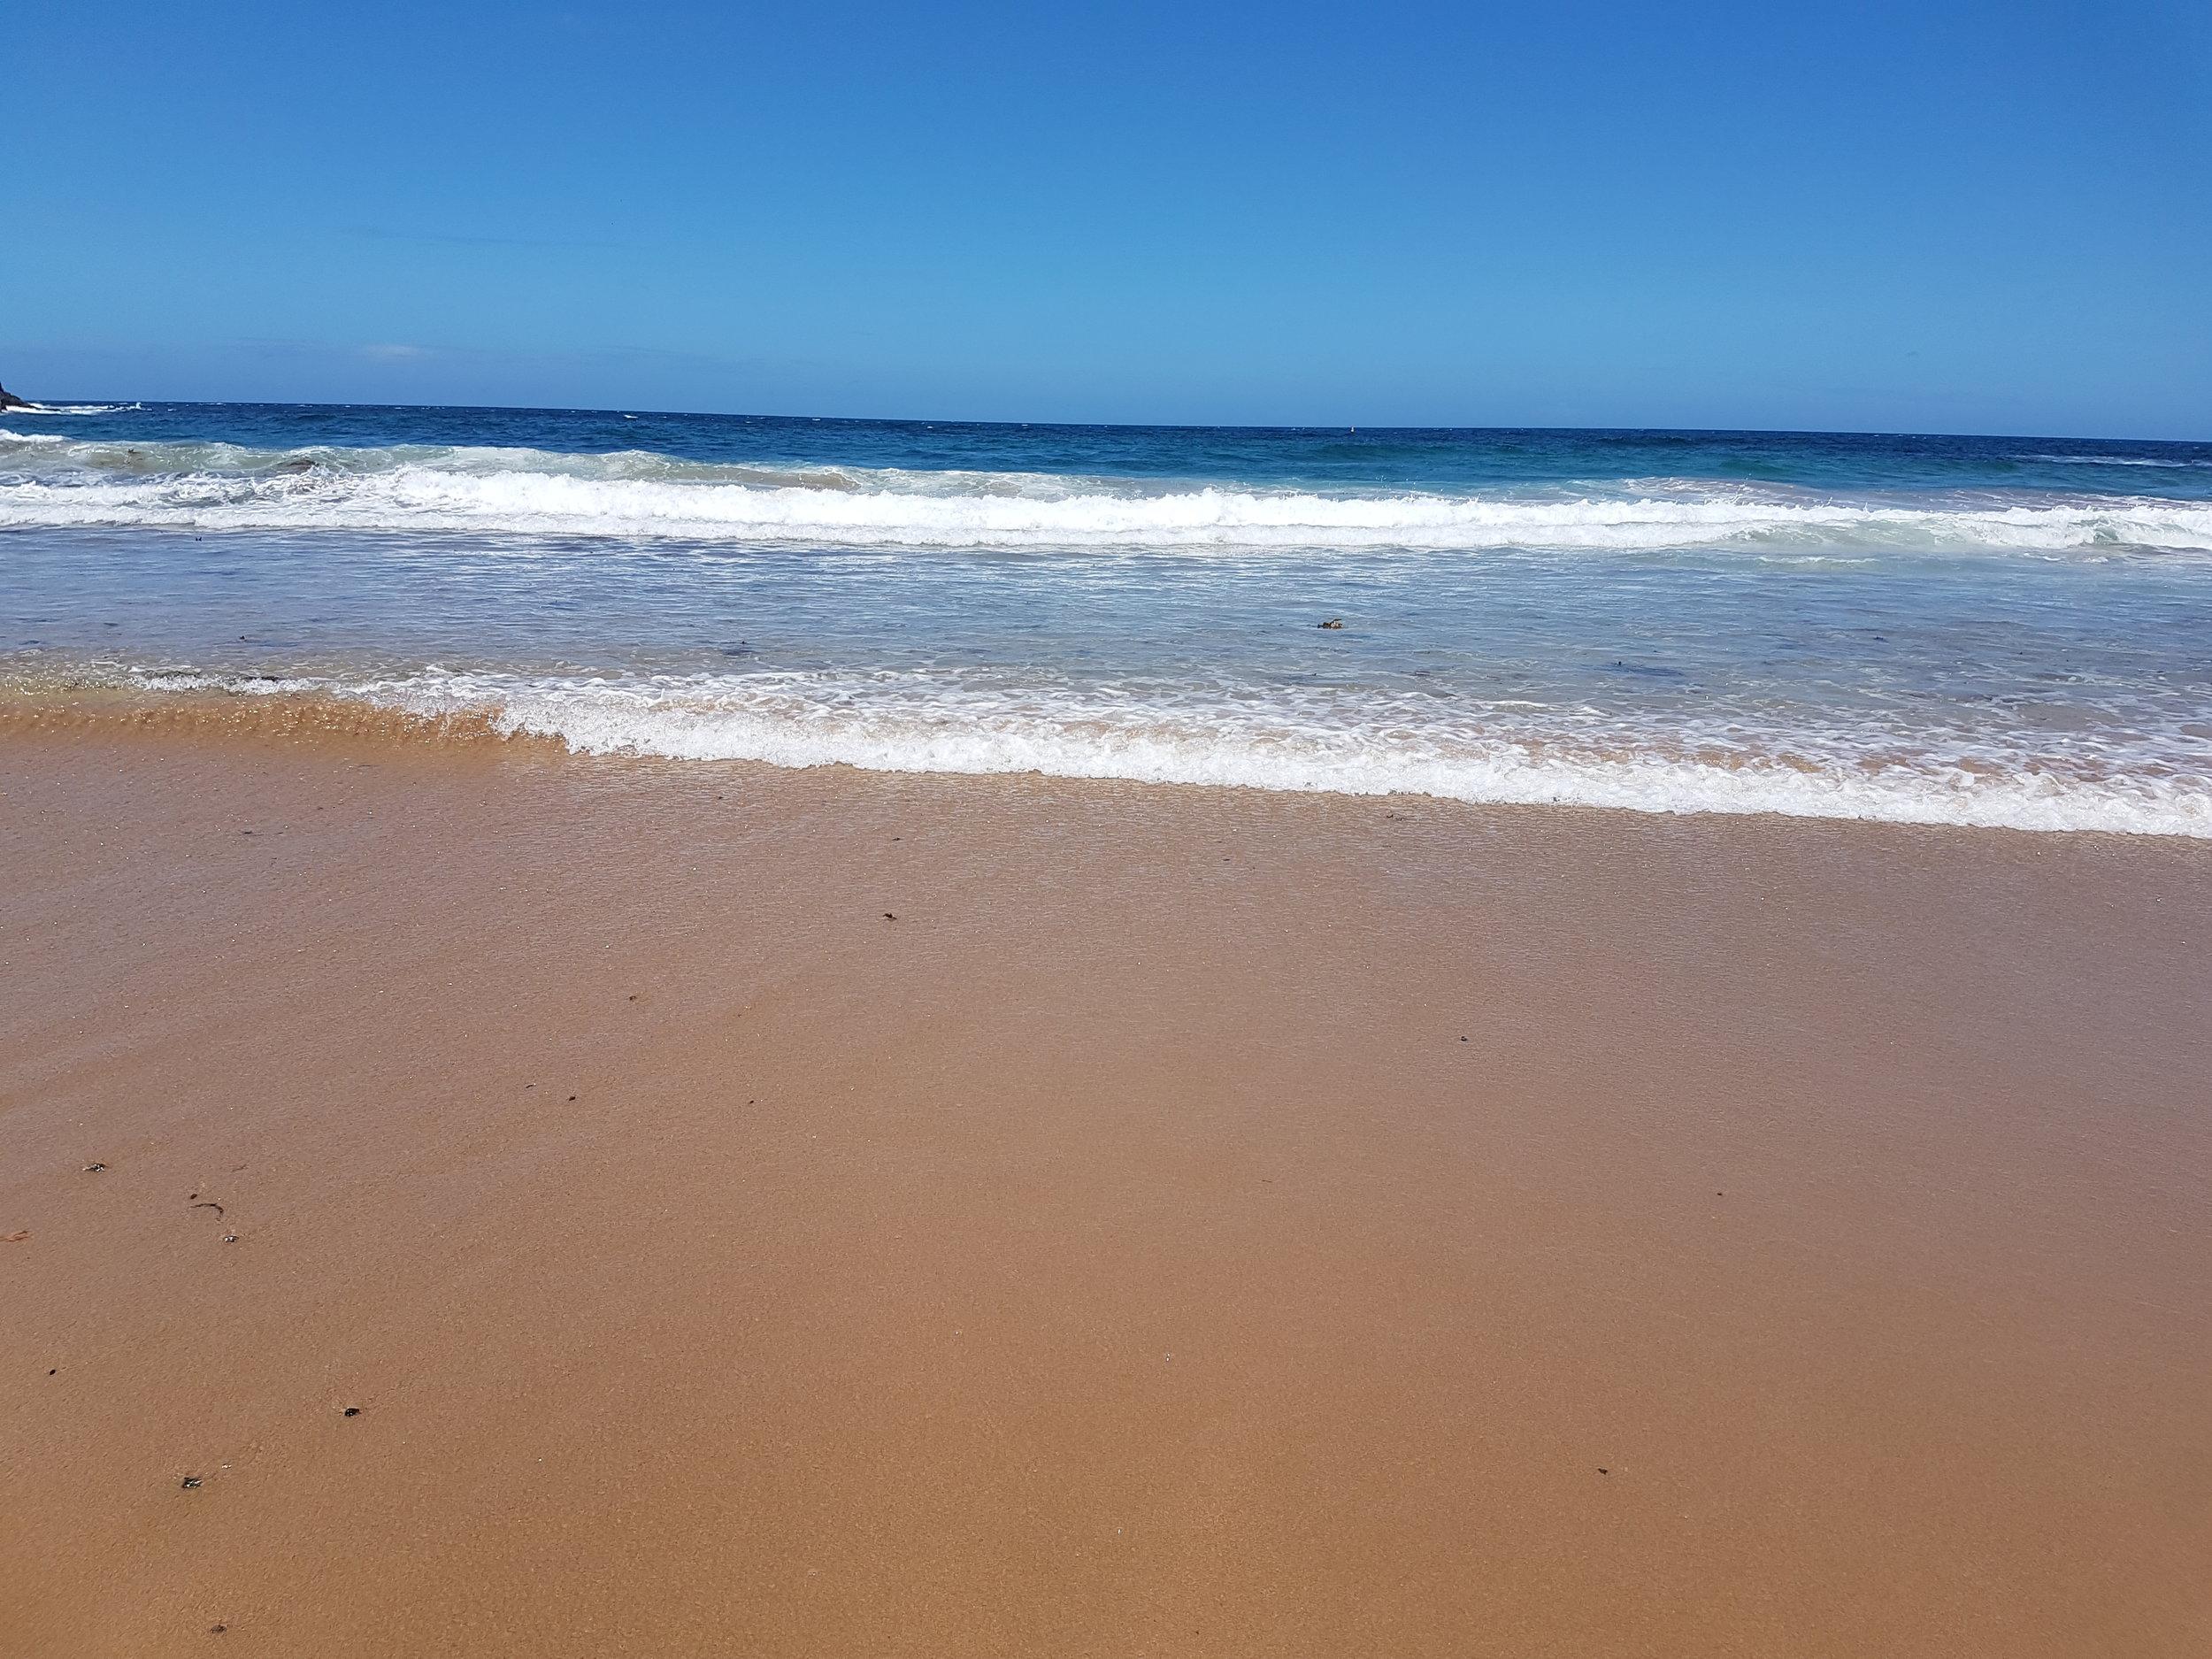 Shhh-wap-shhh-wap went the ocean - Crshh-wap-crshh-wap went the waves.